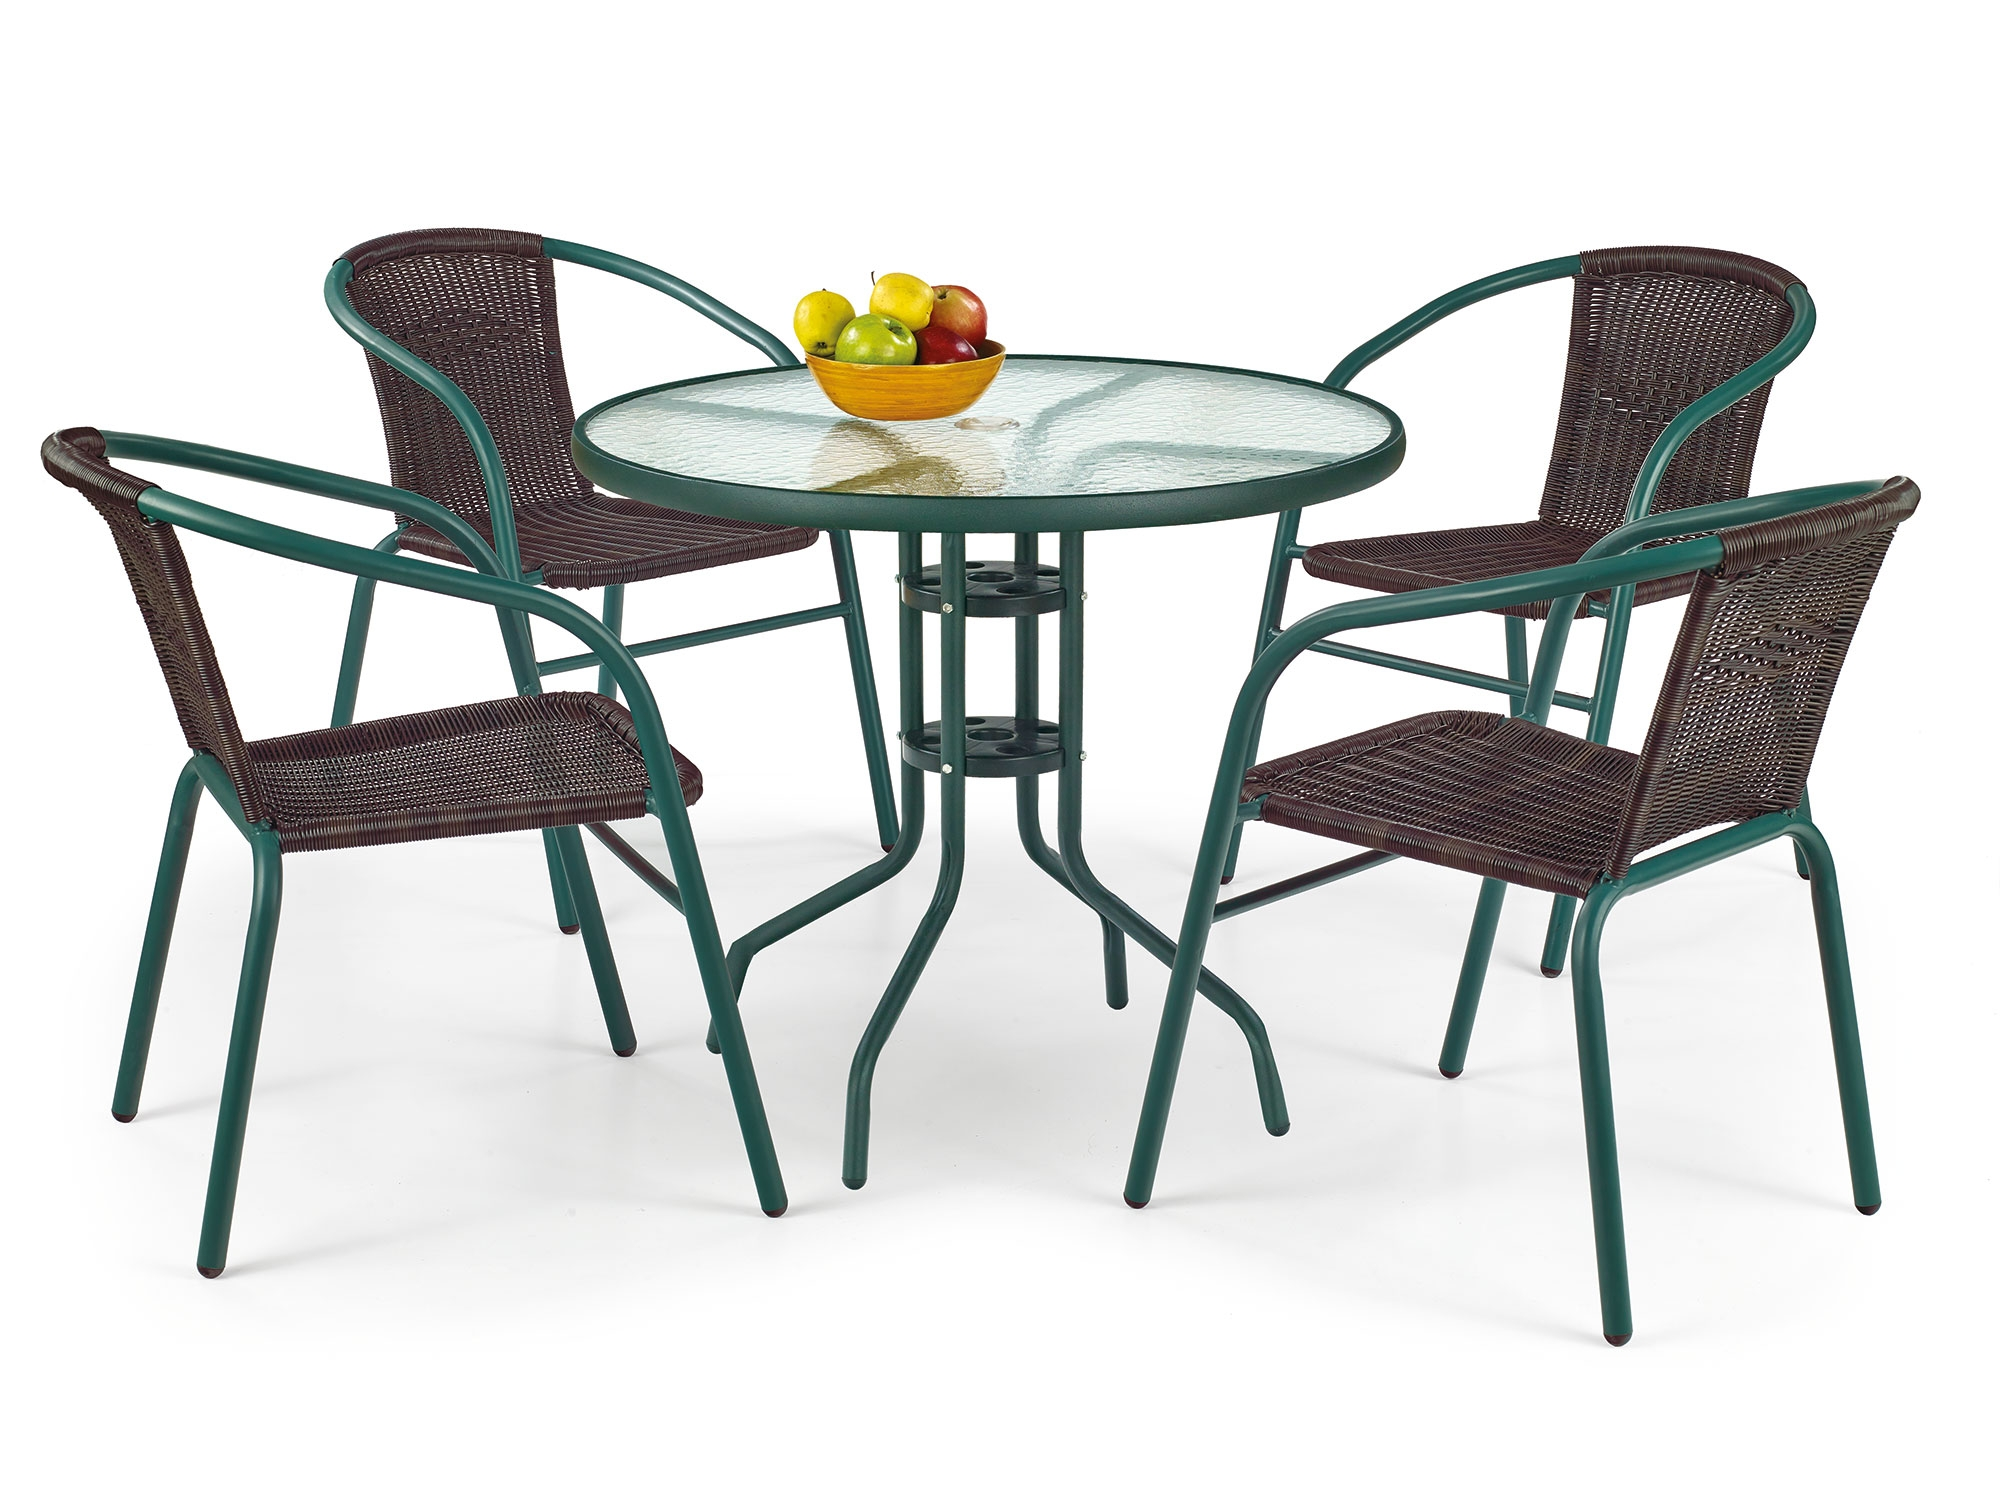 Set masa din sticla cu picioare metalice Grand Verde + 4 scaune din ratan sintetic Grand II Maro / Verde, Ø80xh72 cm